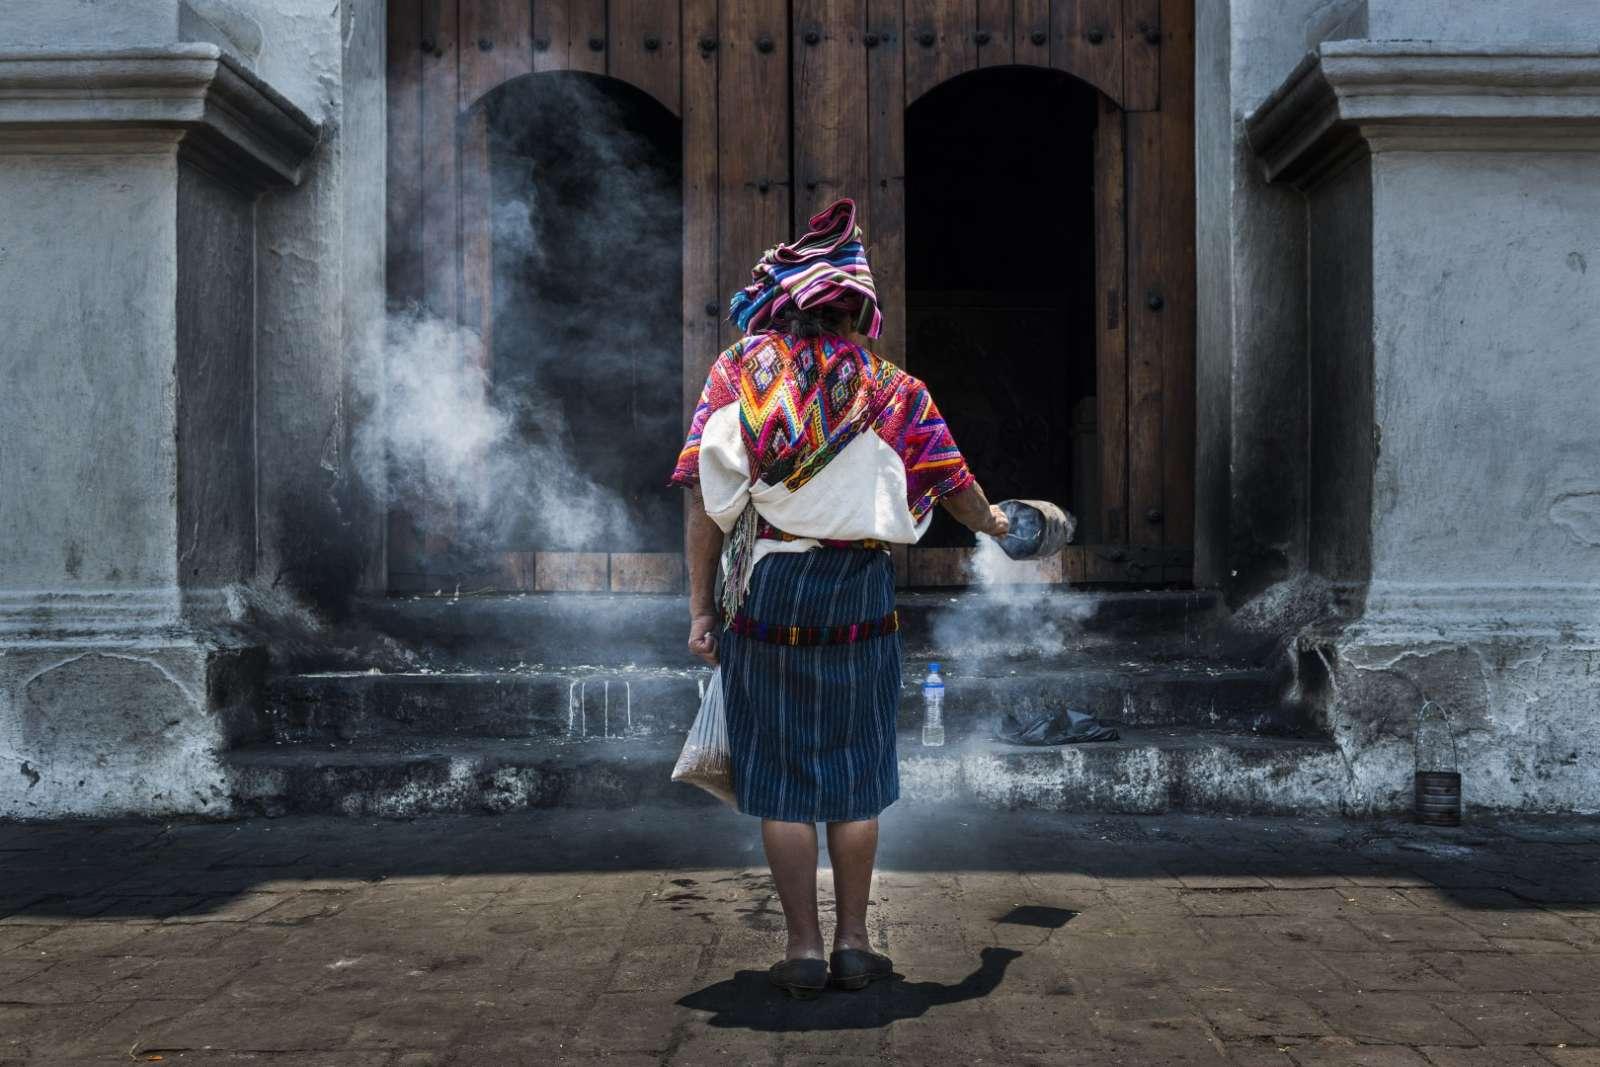 Mayan woman praying in front of Santo Tomas church at Chichicastenango, Guatemala